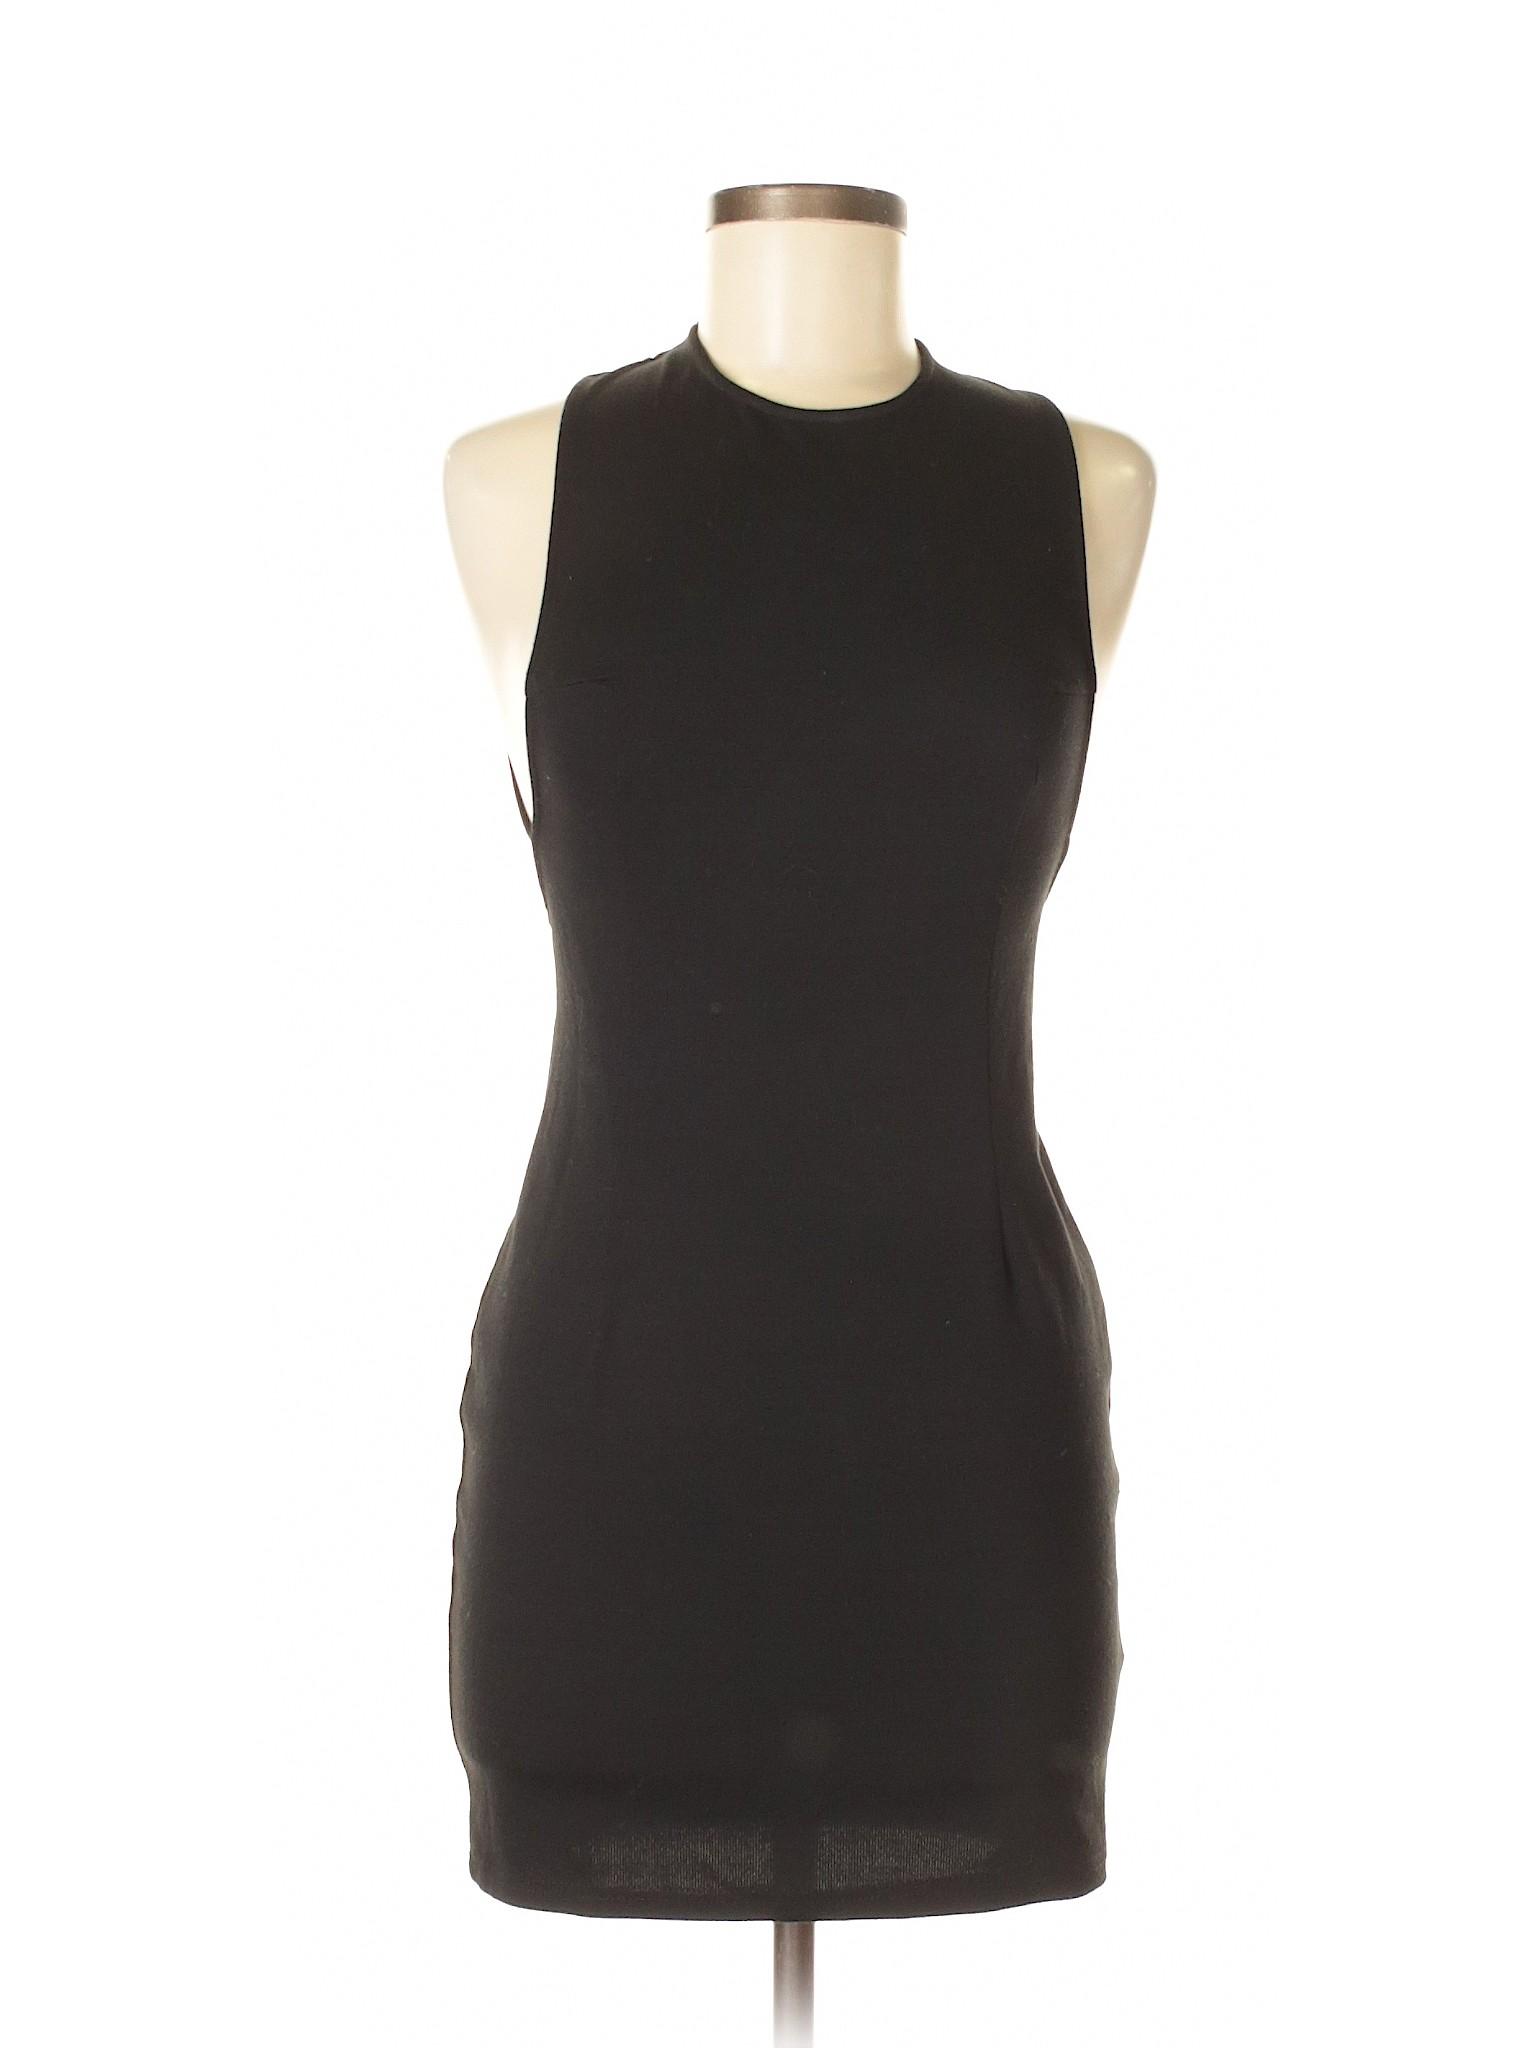 Dress TOBI Selling Casual Casual Dress Casual Selling Selling TOBI Casual Dress Selling TOBI Dress Selling TOBI Zdwqn4C